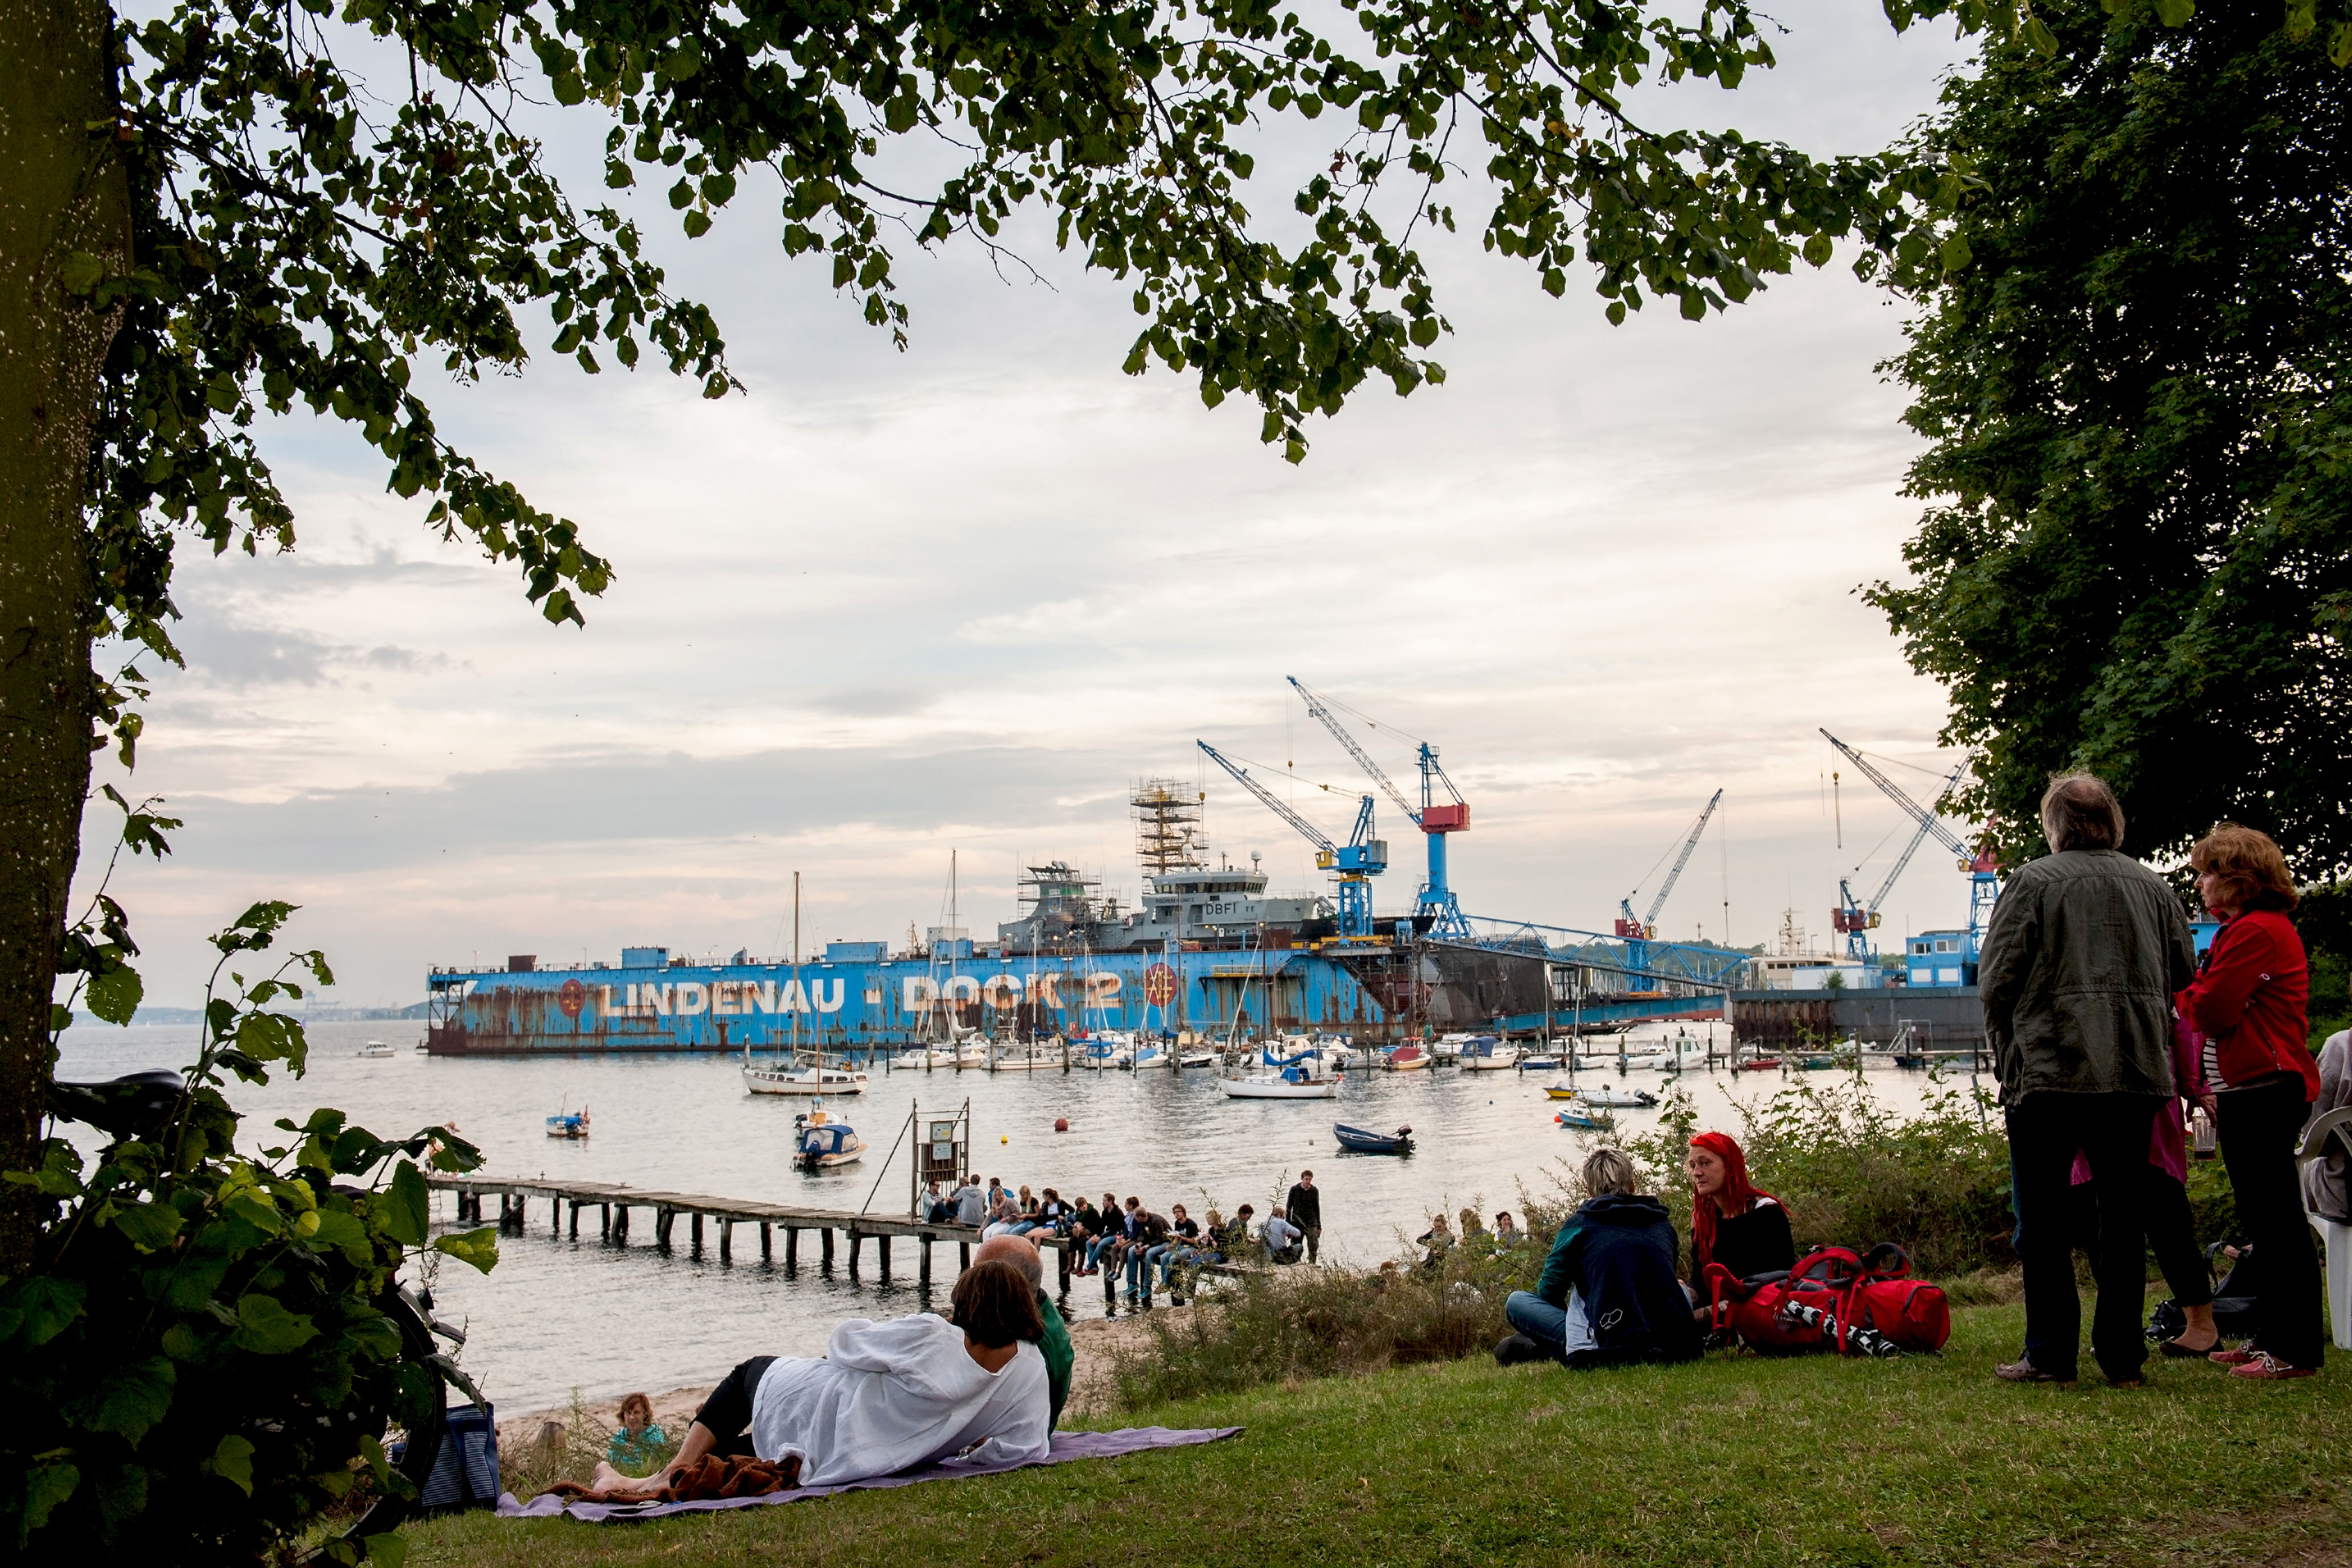 Festival am kleinen Strand.